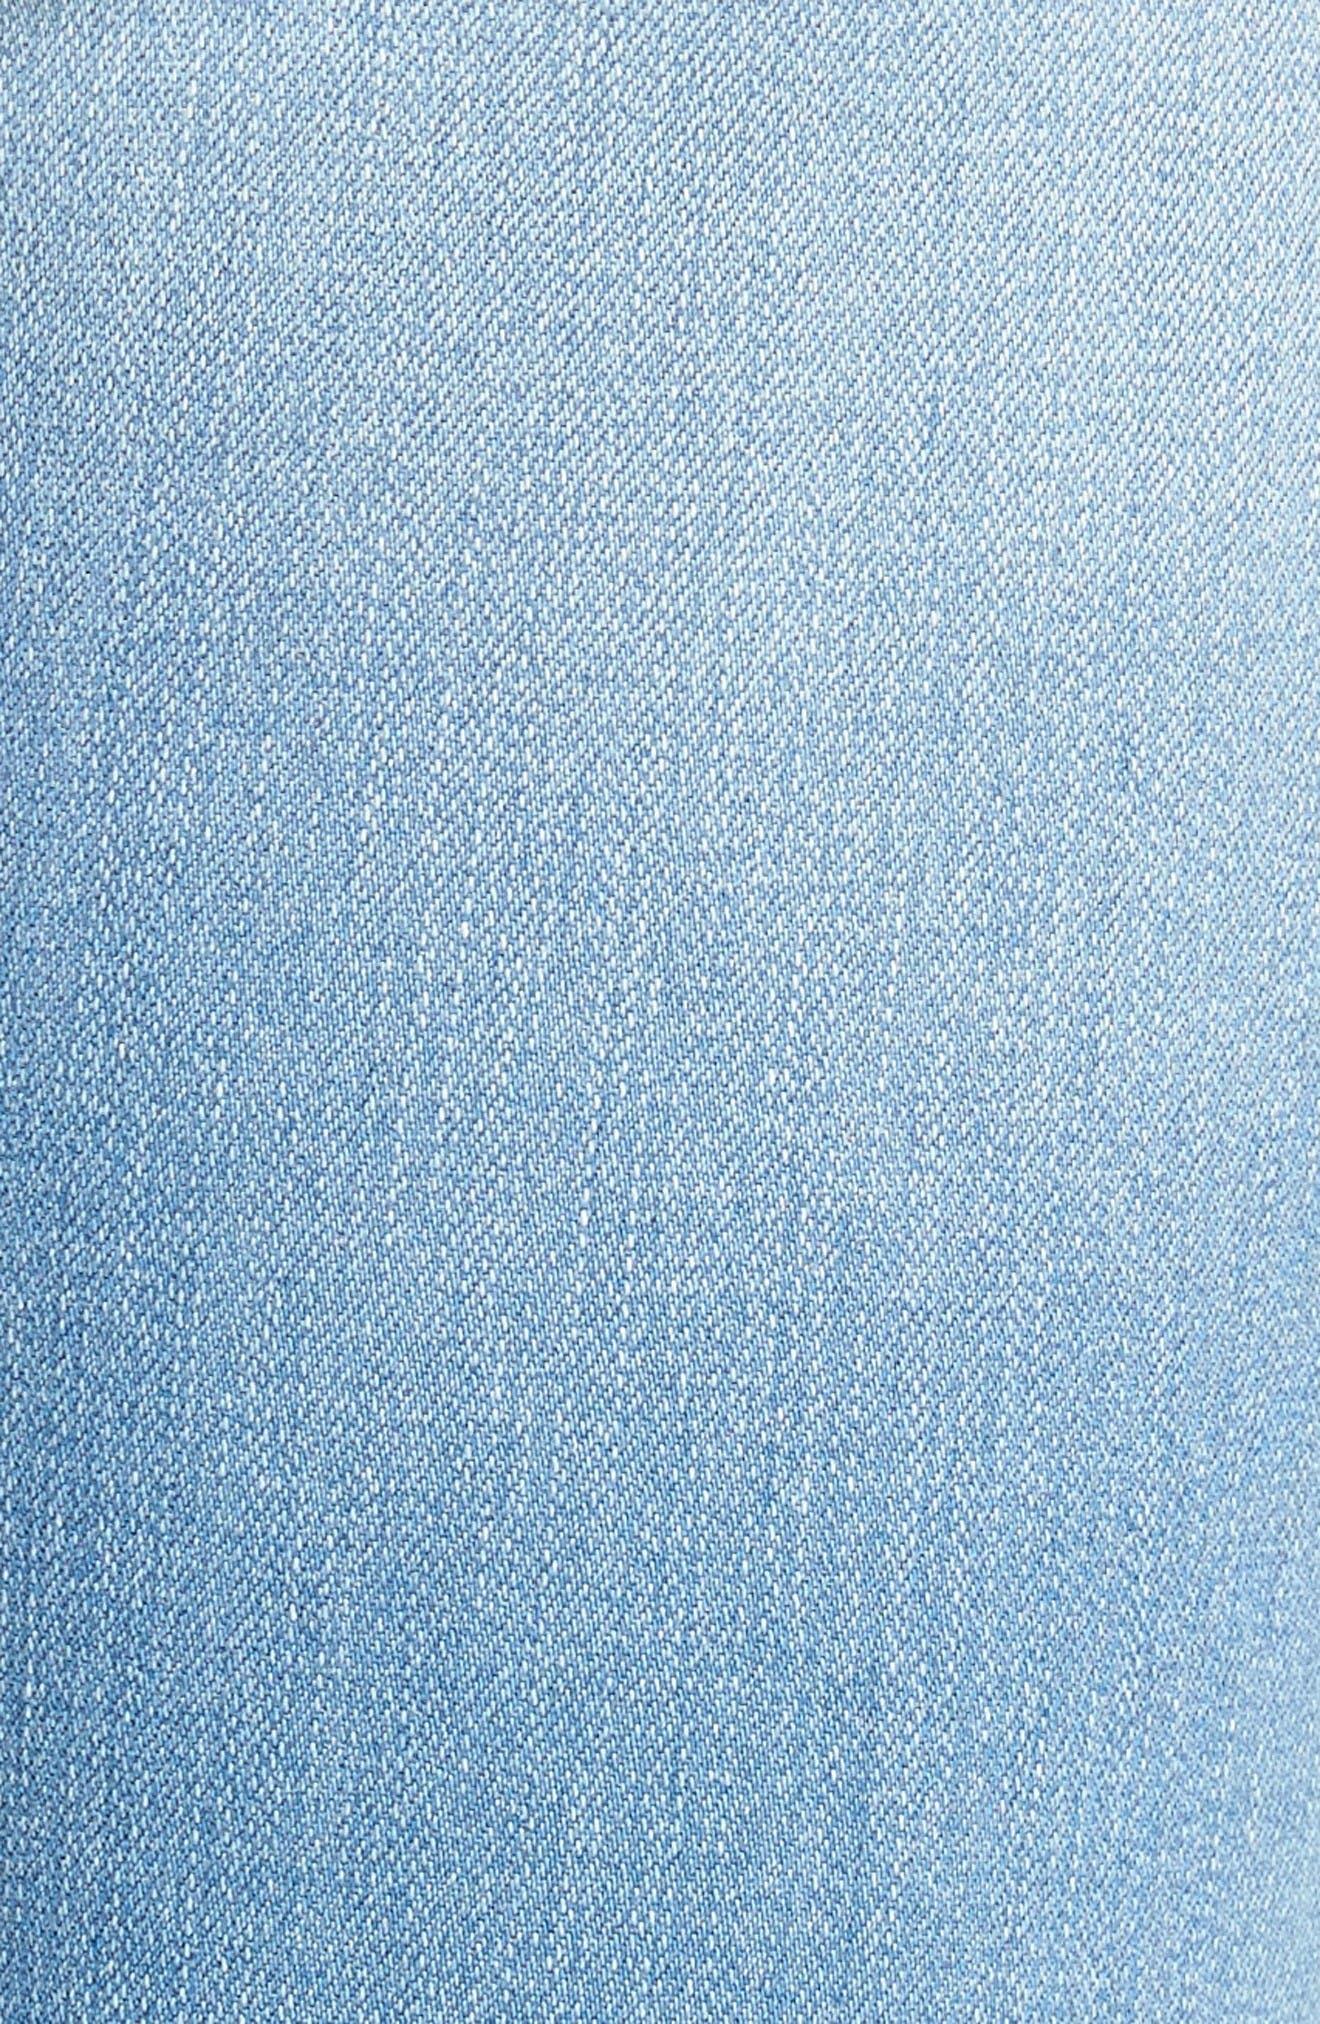 Alternate Image 5  - Articles of Society Sarah Skinny Jeans (Bay)